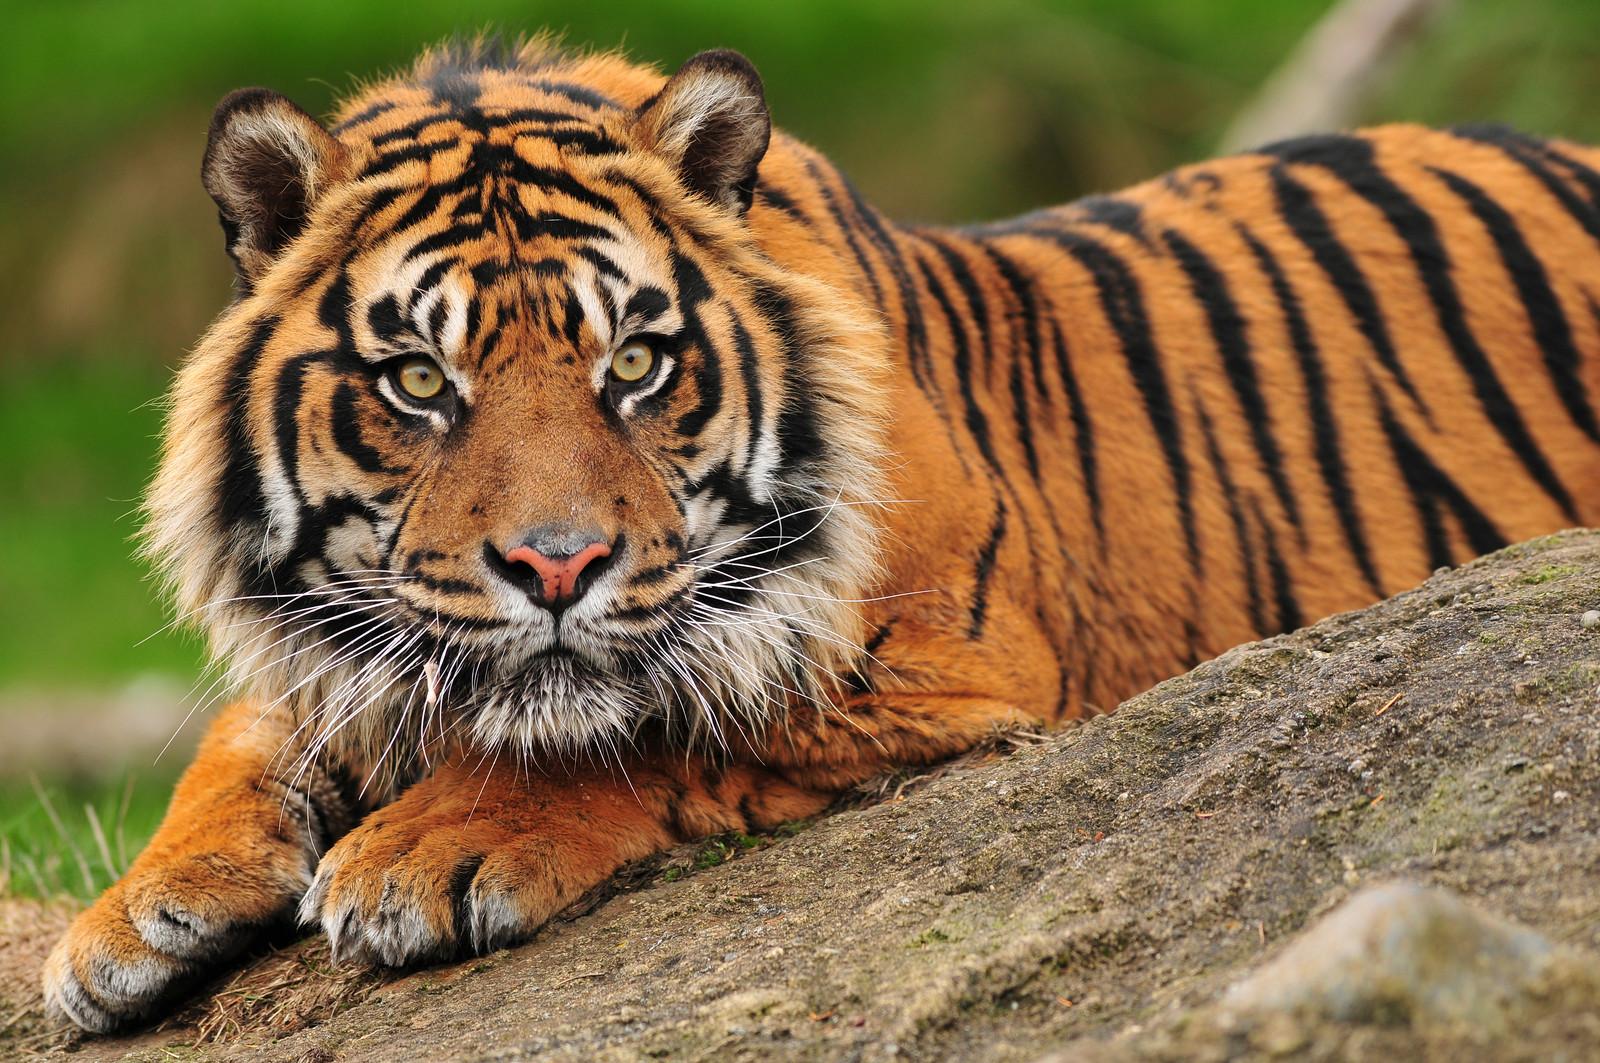 Be A Crouching Tiger At Meetings